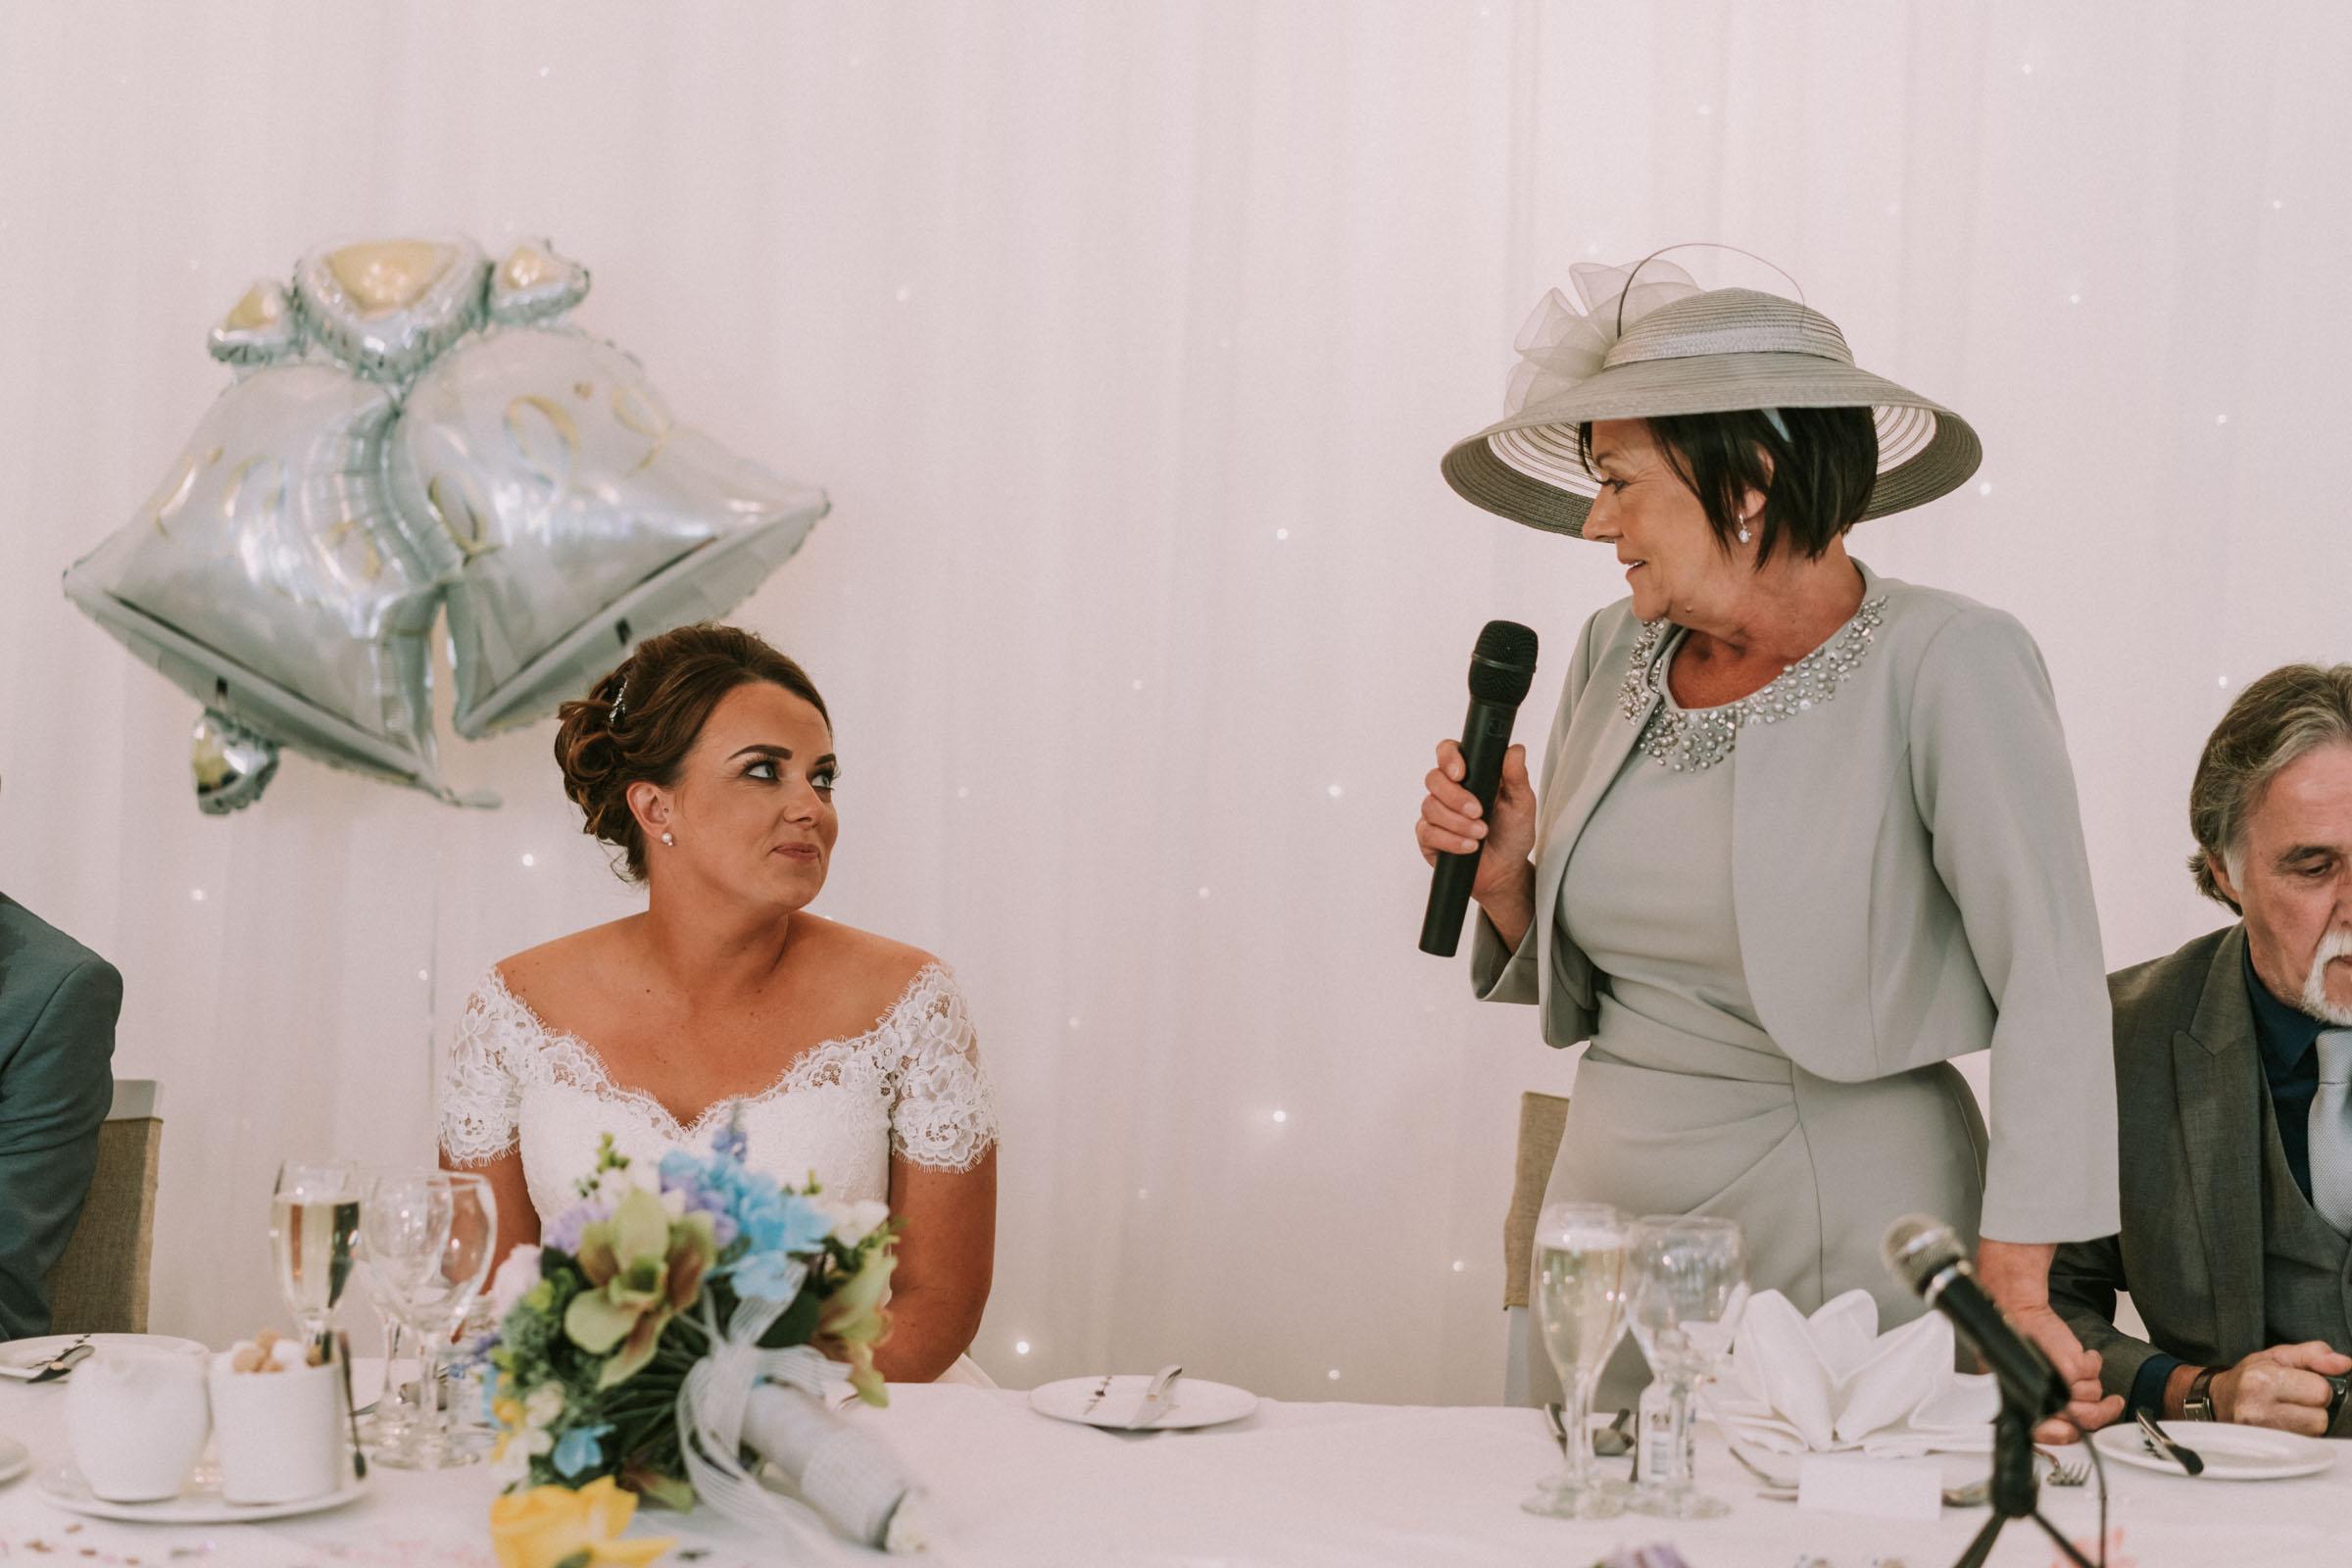 Dalmeny-Park-Glasgow-Wedding-Dearly-Photography-Scotland (63 of 75).jpg